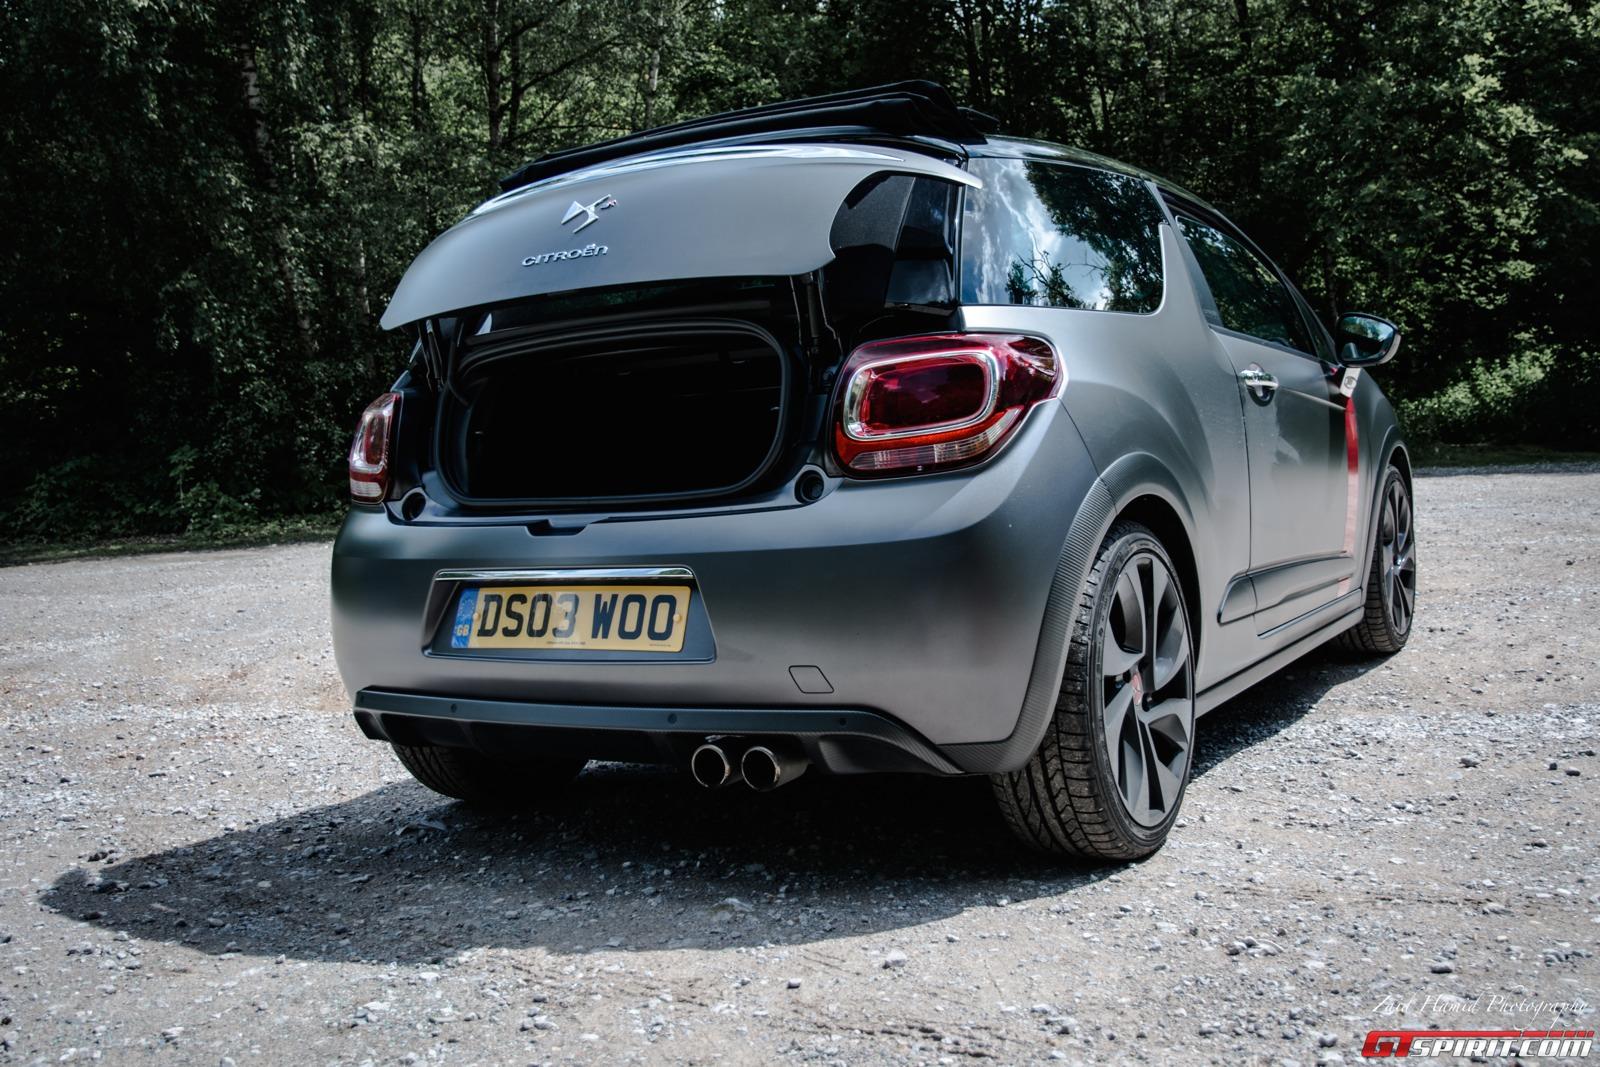 citro n ds3 racing cabrio review gtspirit. Black Bedroom Furniture Sets. Home Design Ideas